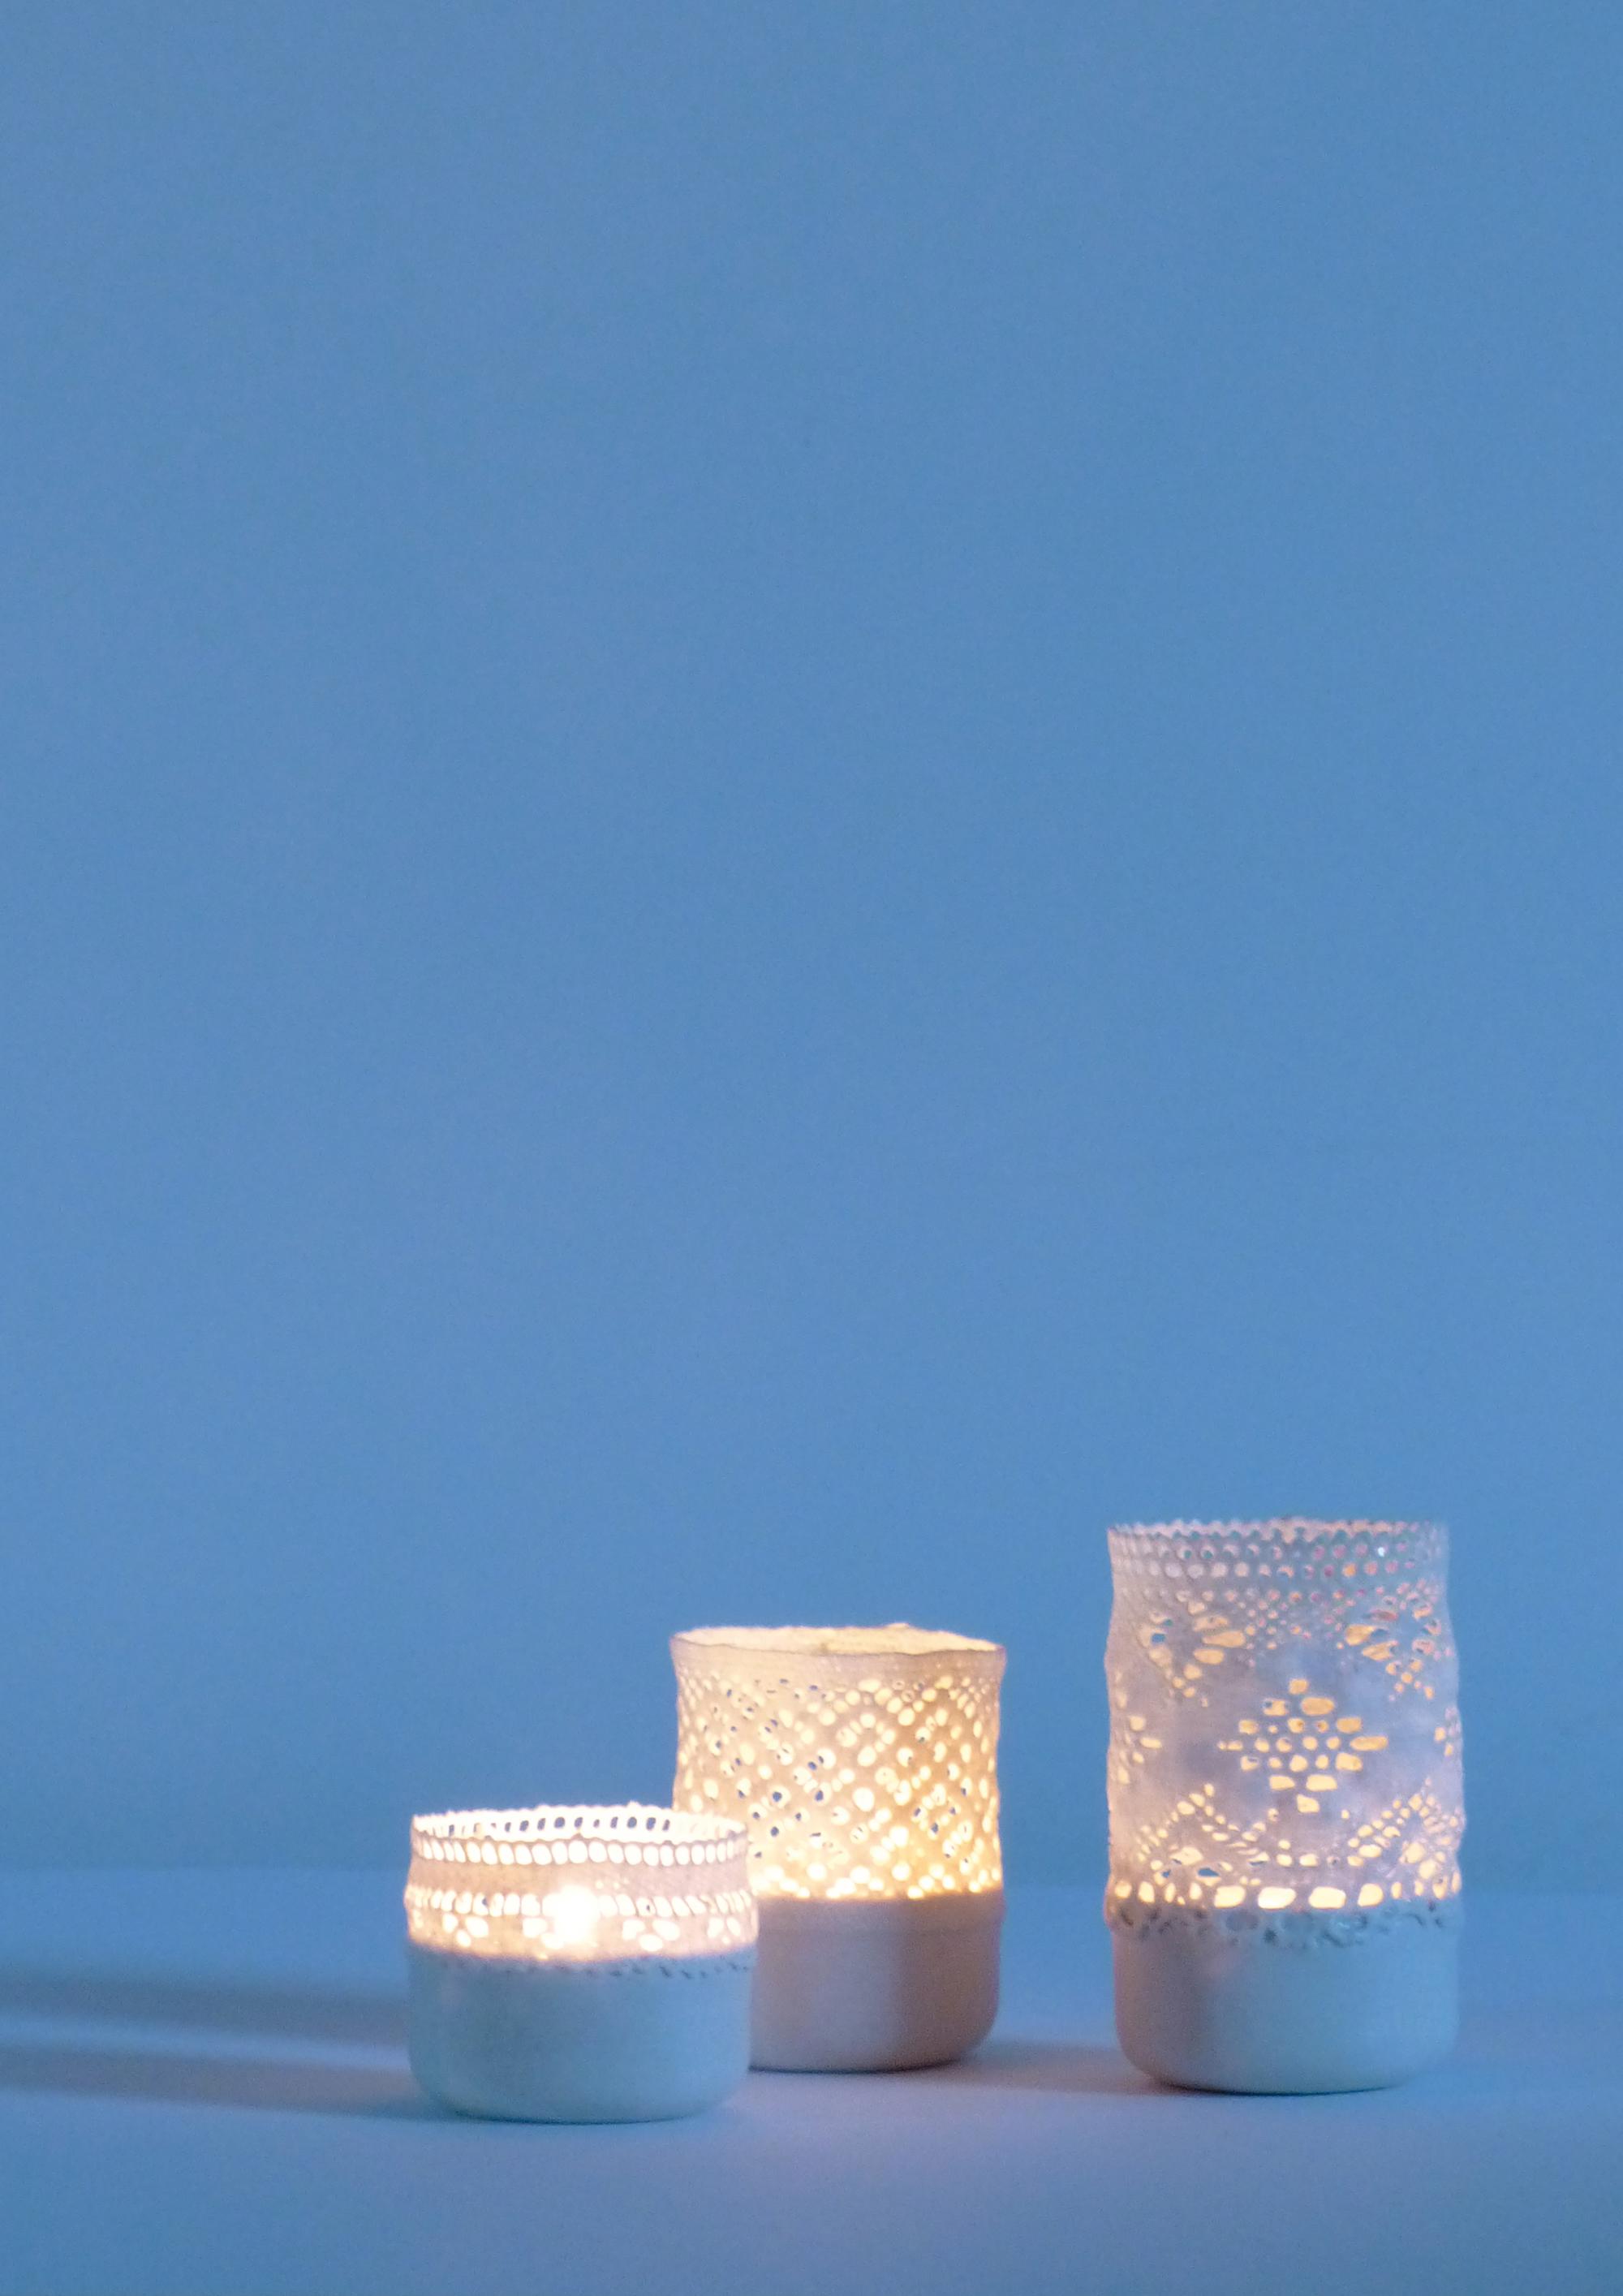 minicollection-tealights-a-studiokryszewski.jpg